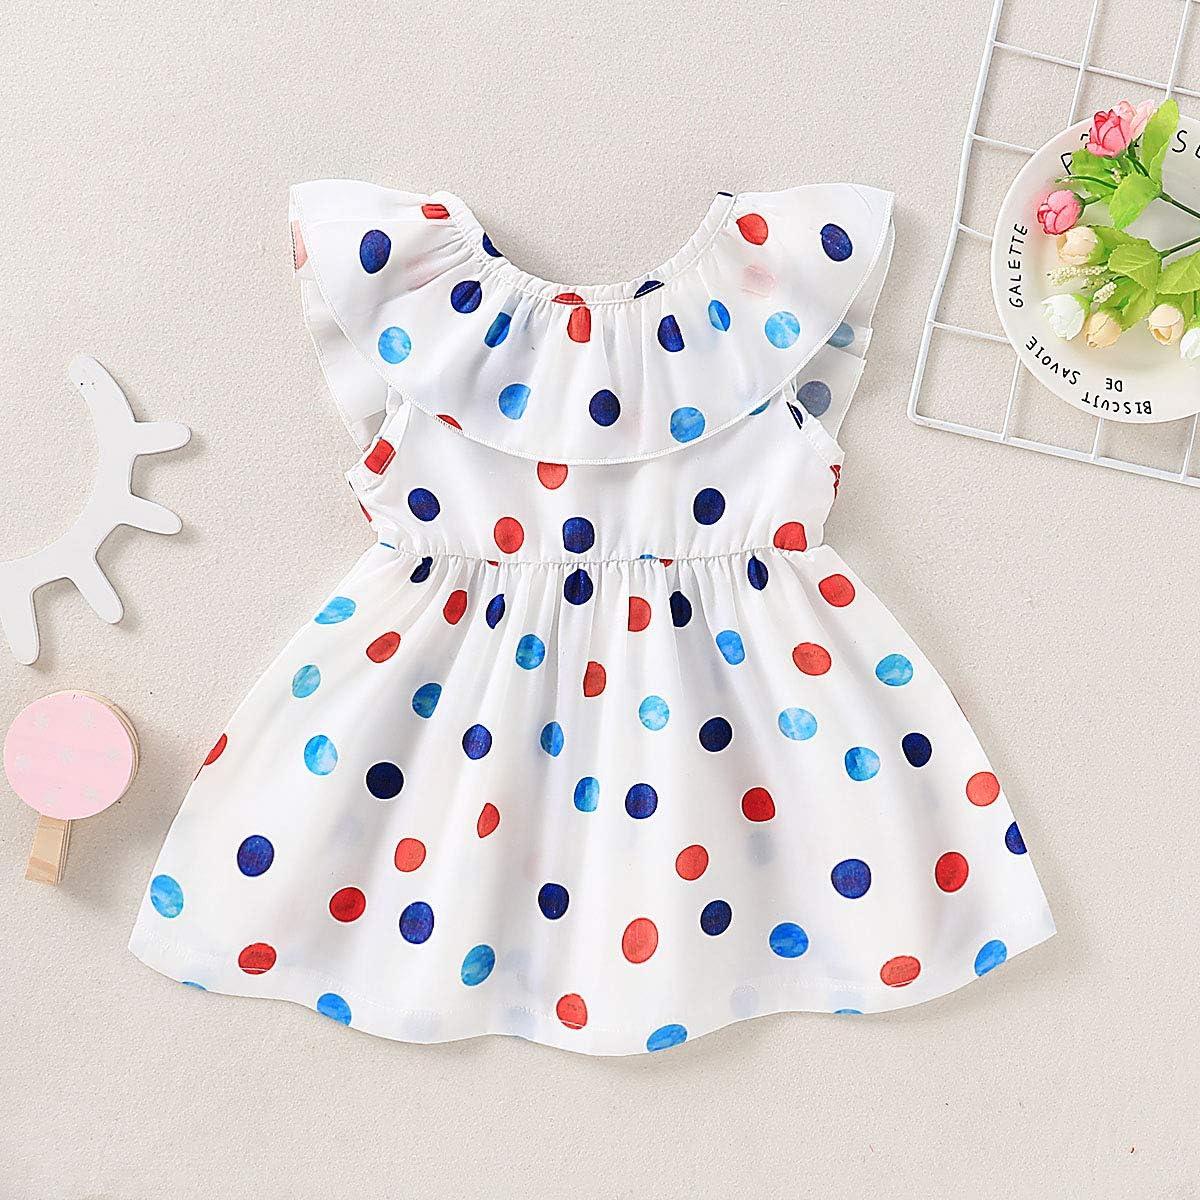 Rainbow Paint Toddler Baby Girls Cotton Ruffle Short Sleeve Top Basic T-Shirt 2-6T